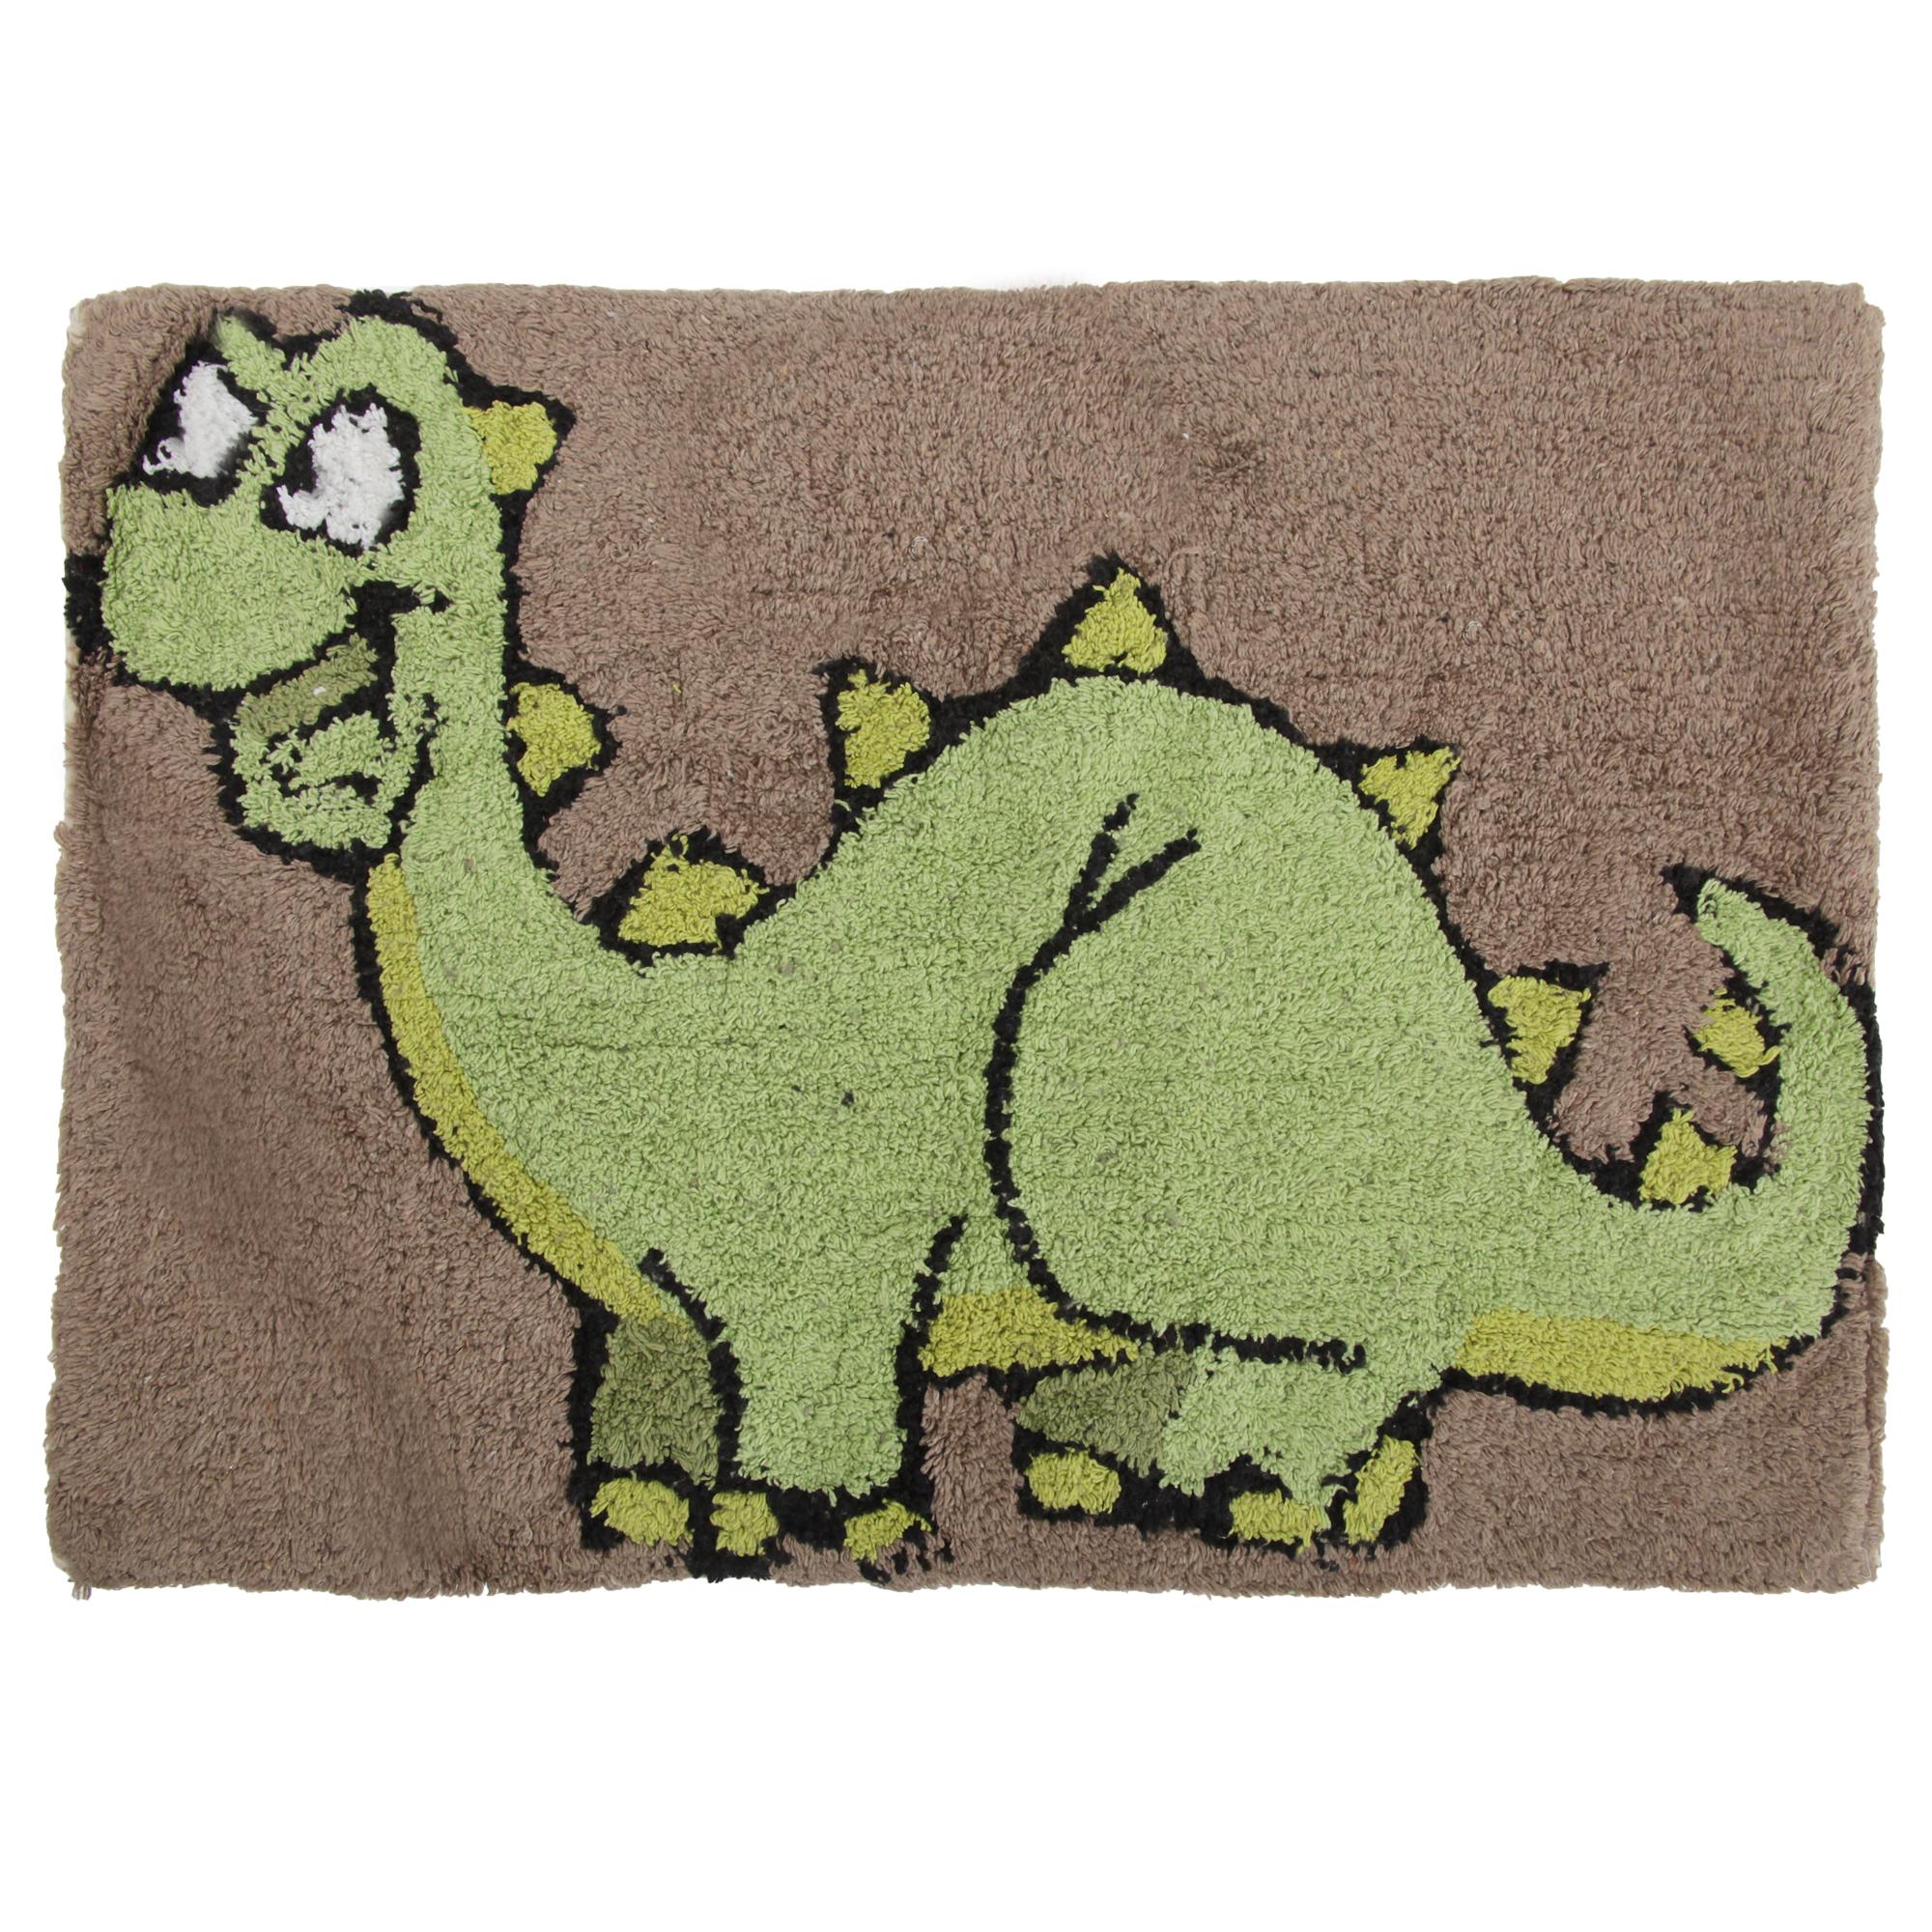 Mucky Fingers Childrens Boys Dinosaur Design Bedroom Floor